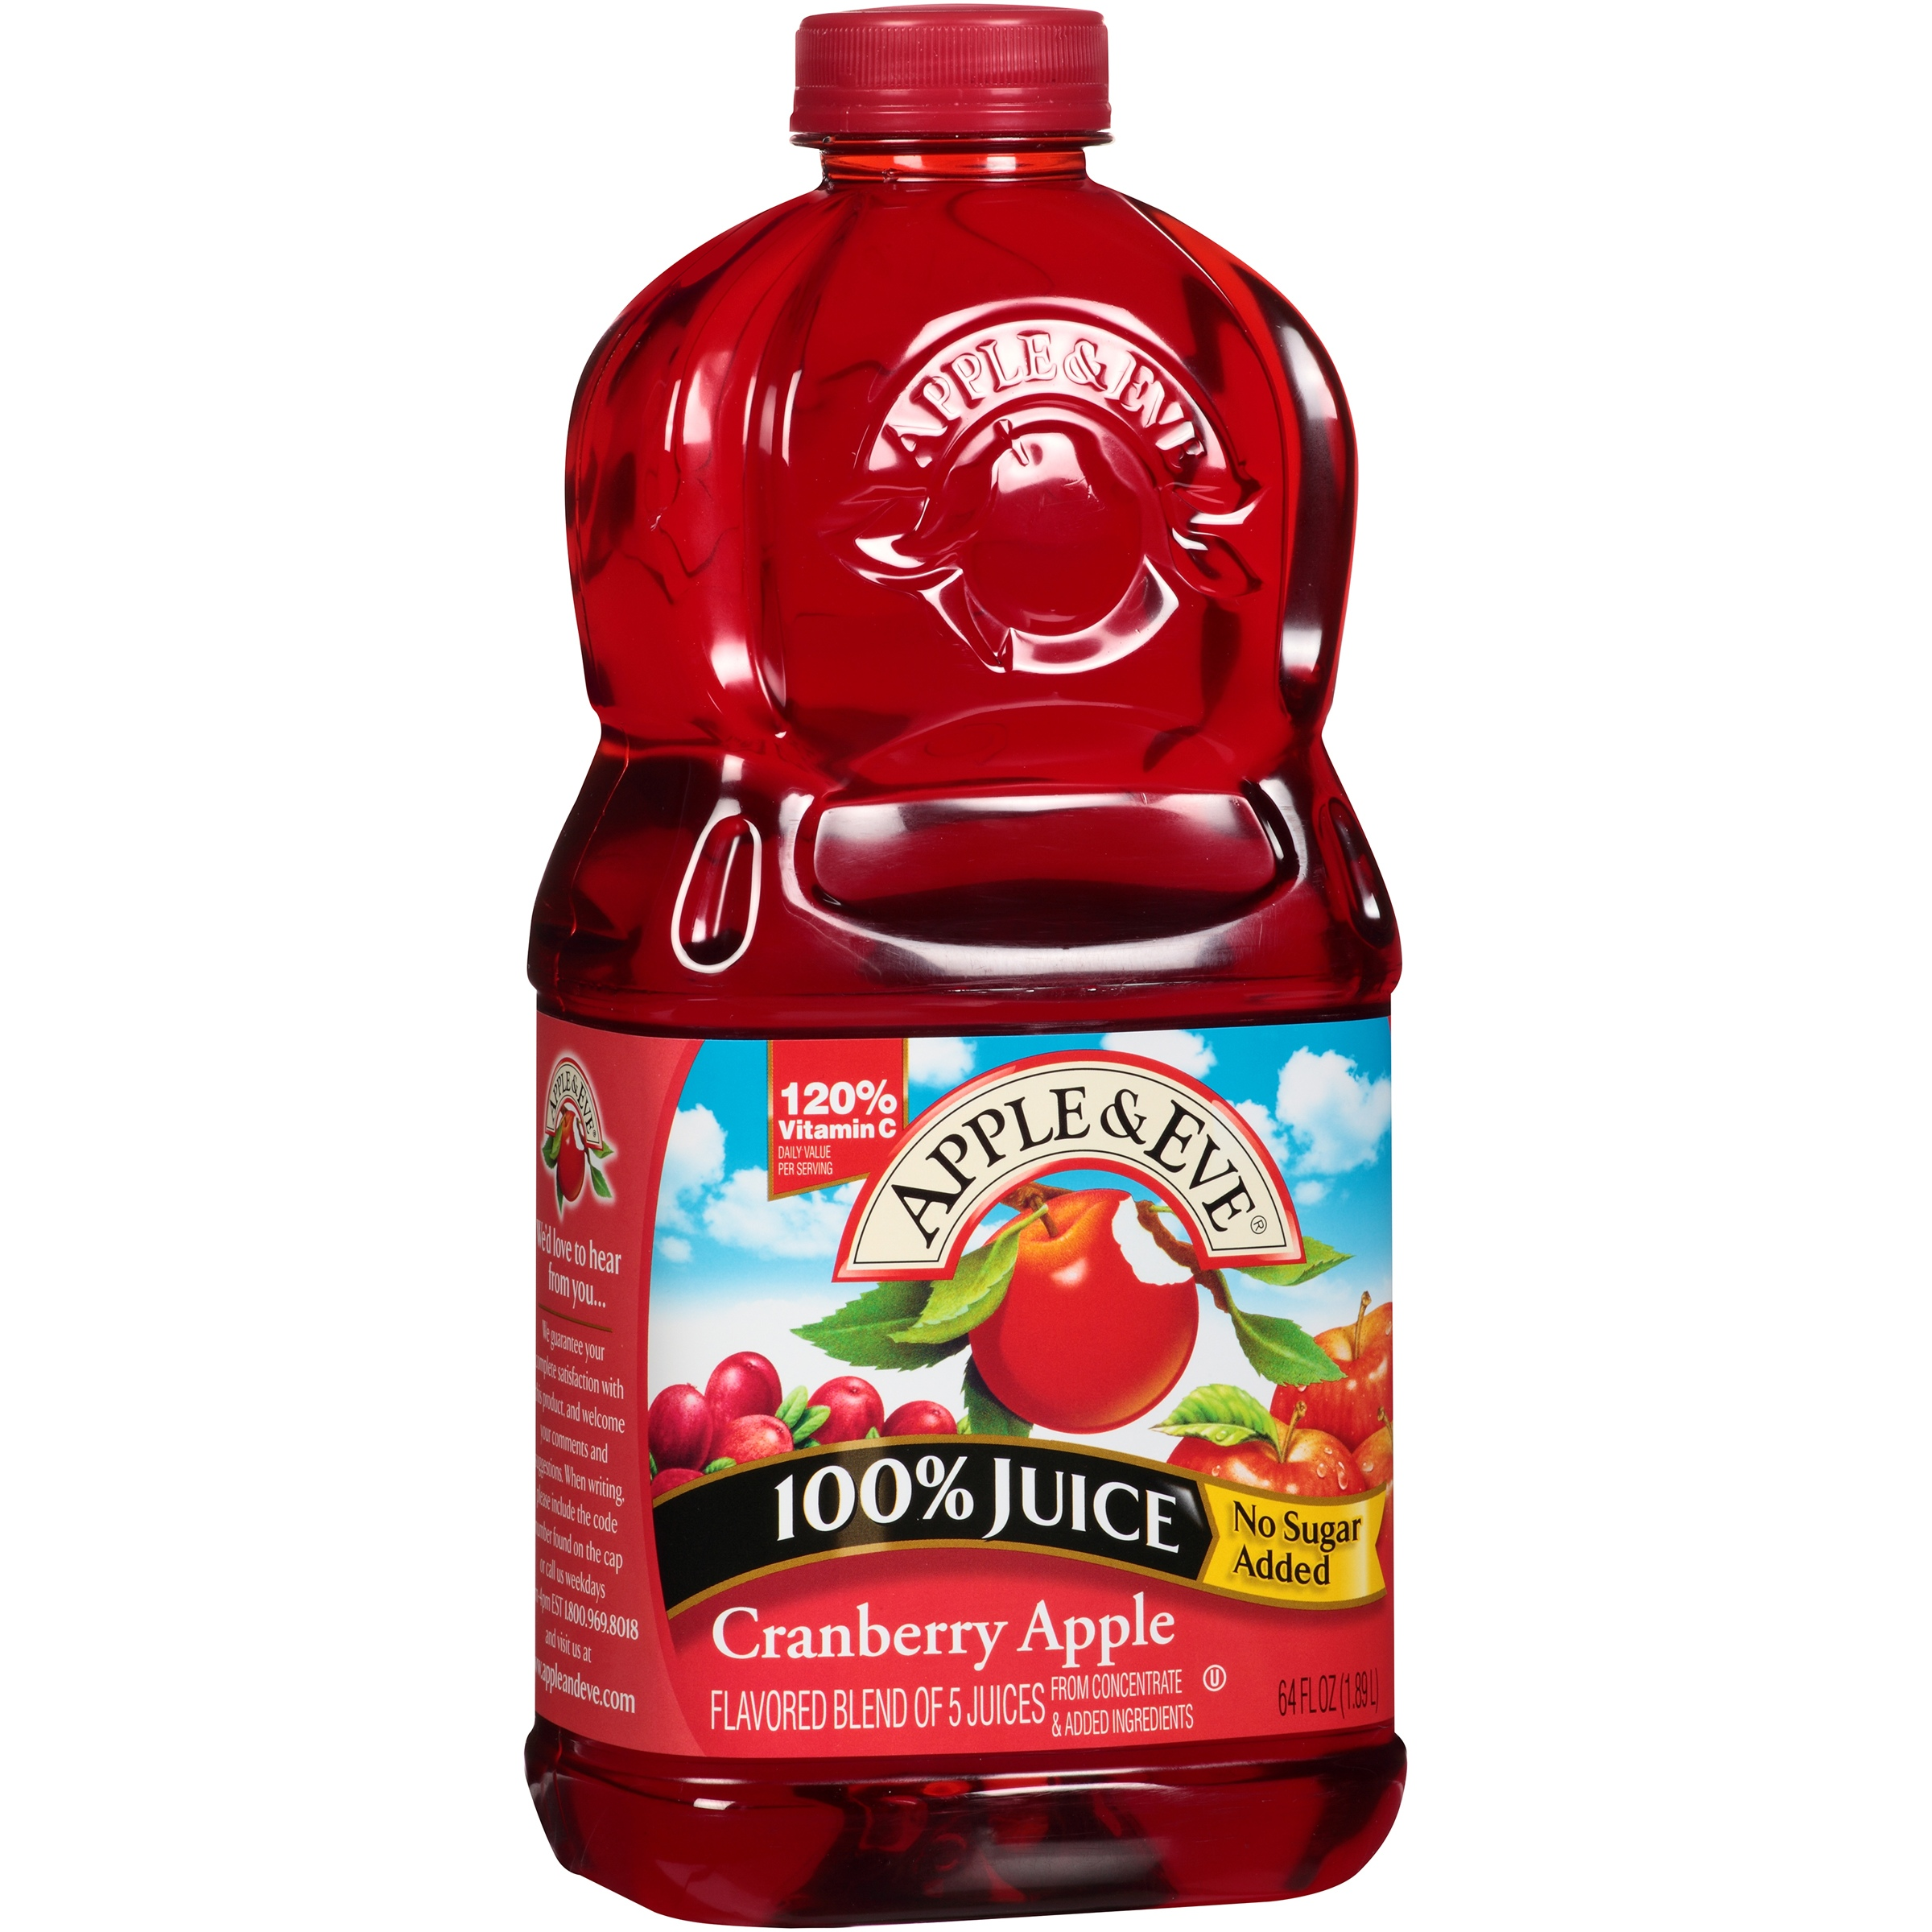 Apple & Eve Cranberry Apple 100% Juice 64 fl. oz. Bottle by Apple & Eve